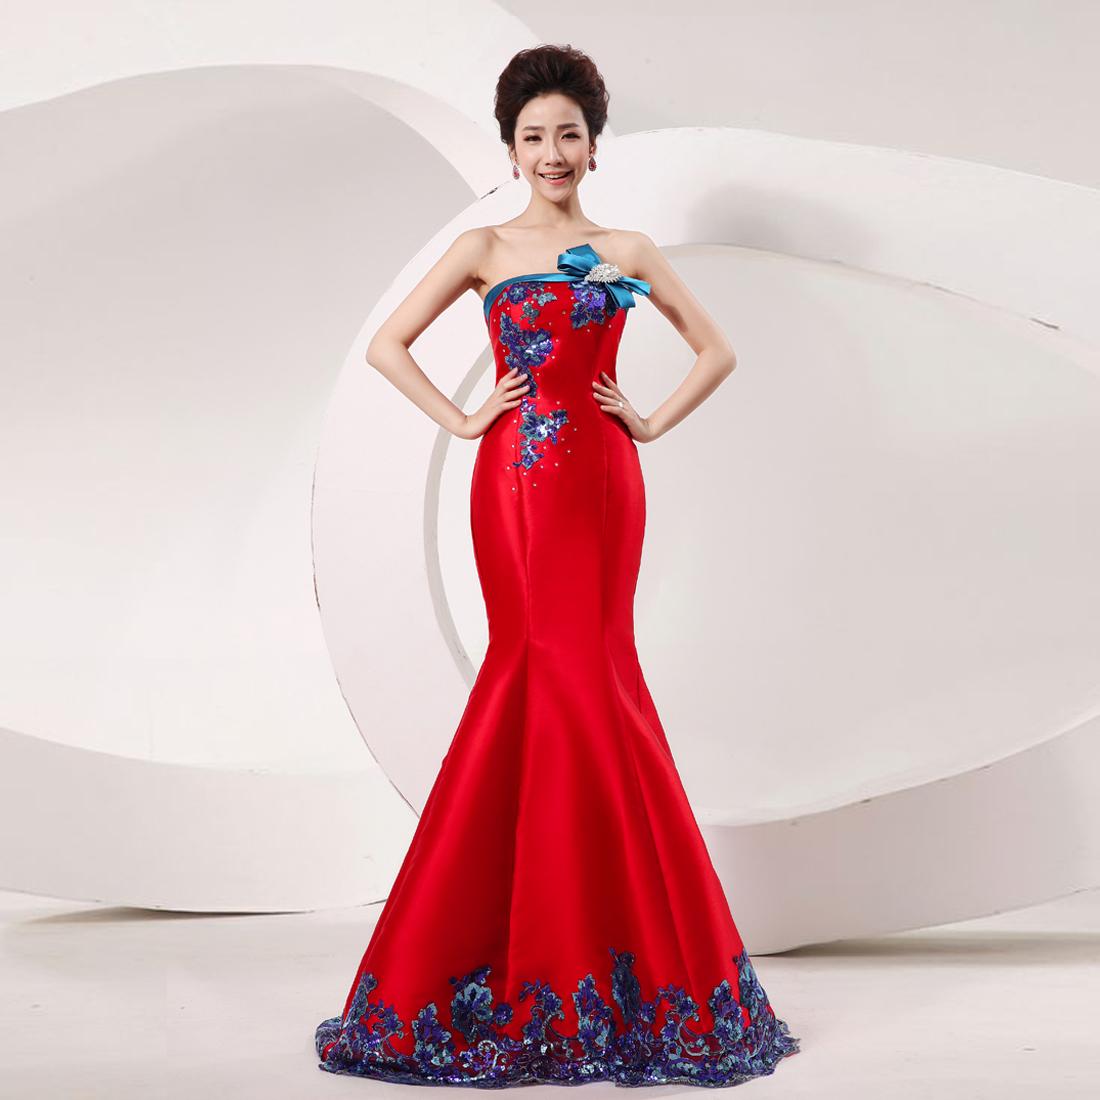 Chinese Wedding Dresses Shopping Website, Chinese Style Wedding Dress, Modern Chinese Wedding Dresses, Chinese Traditional Wedding Dress, Wedding Dress from China, Cheap Chinese Wedding Dresses, China Wedding Dresses Wholesale, Chinese Dresses for Women